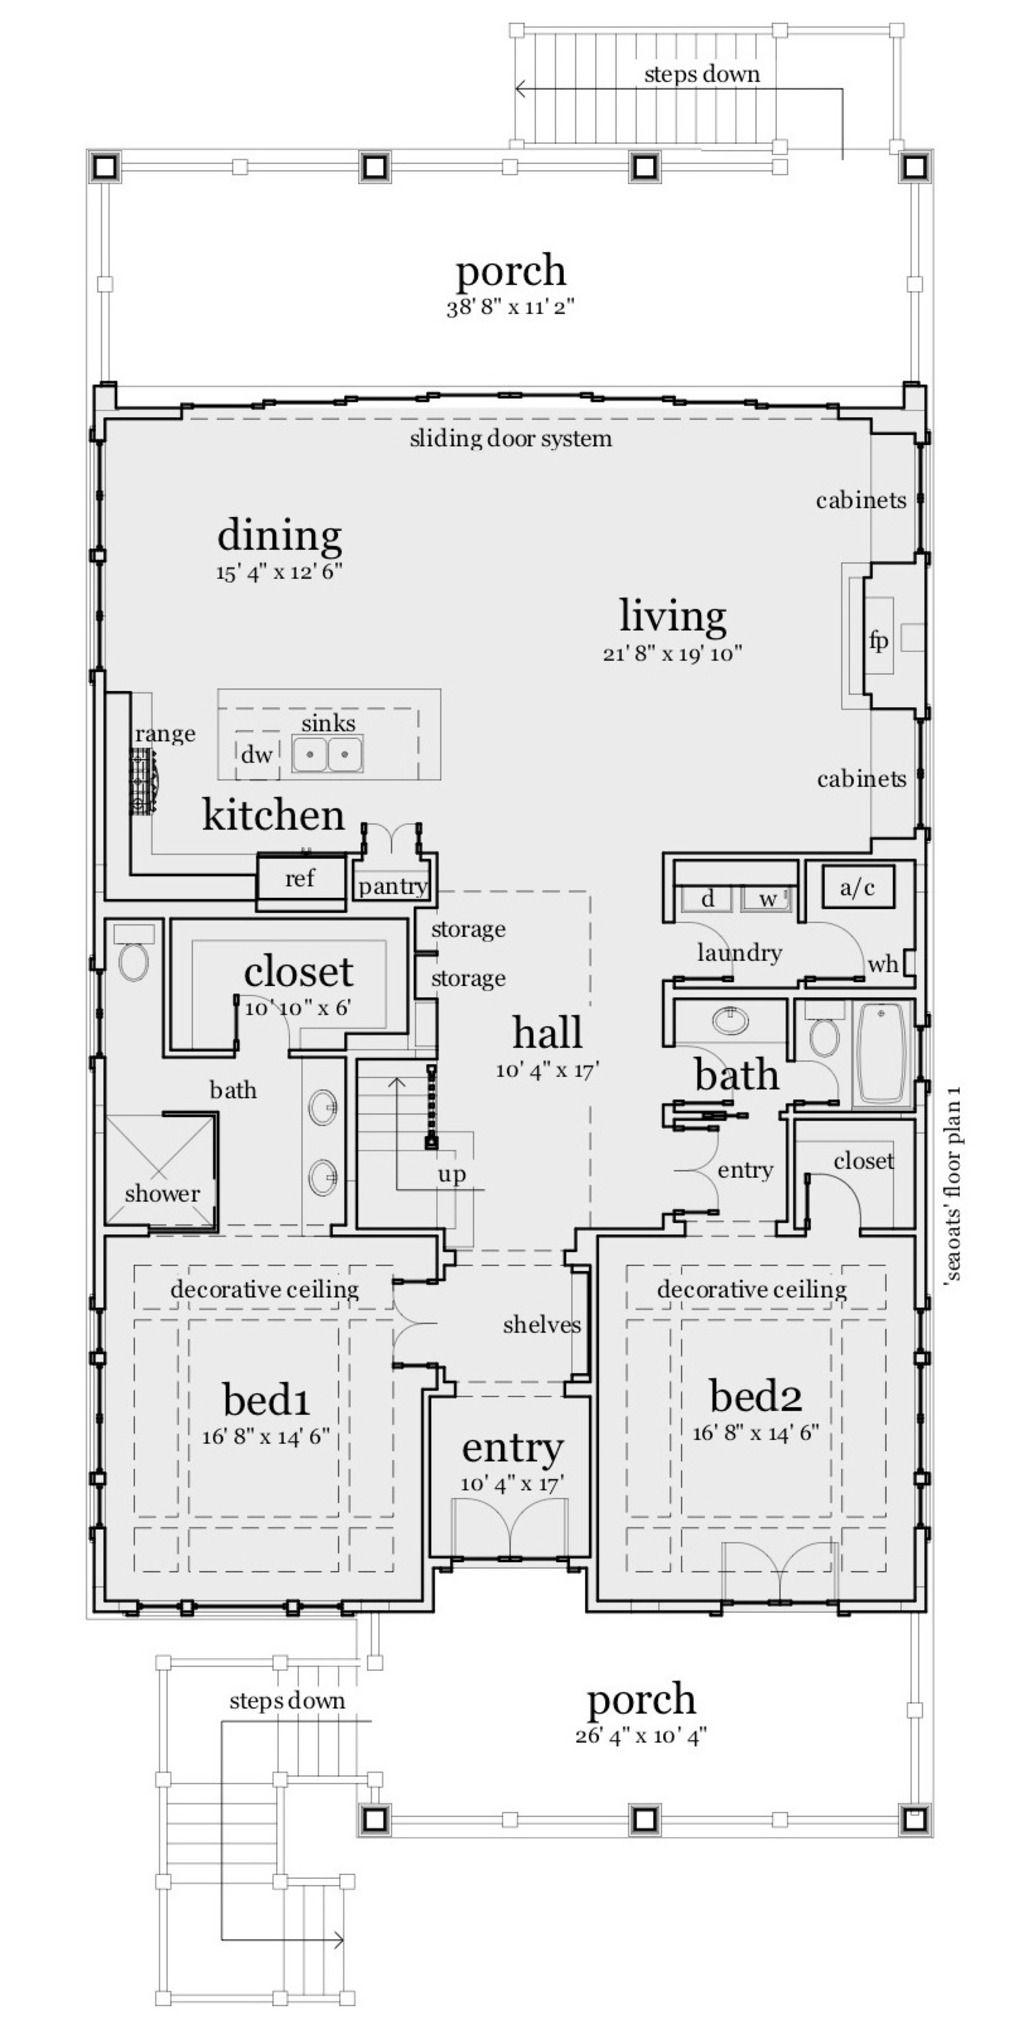 House Plan 028 Narrow Lot Plan 2 621 Square Feet 3